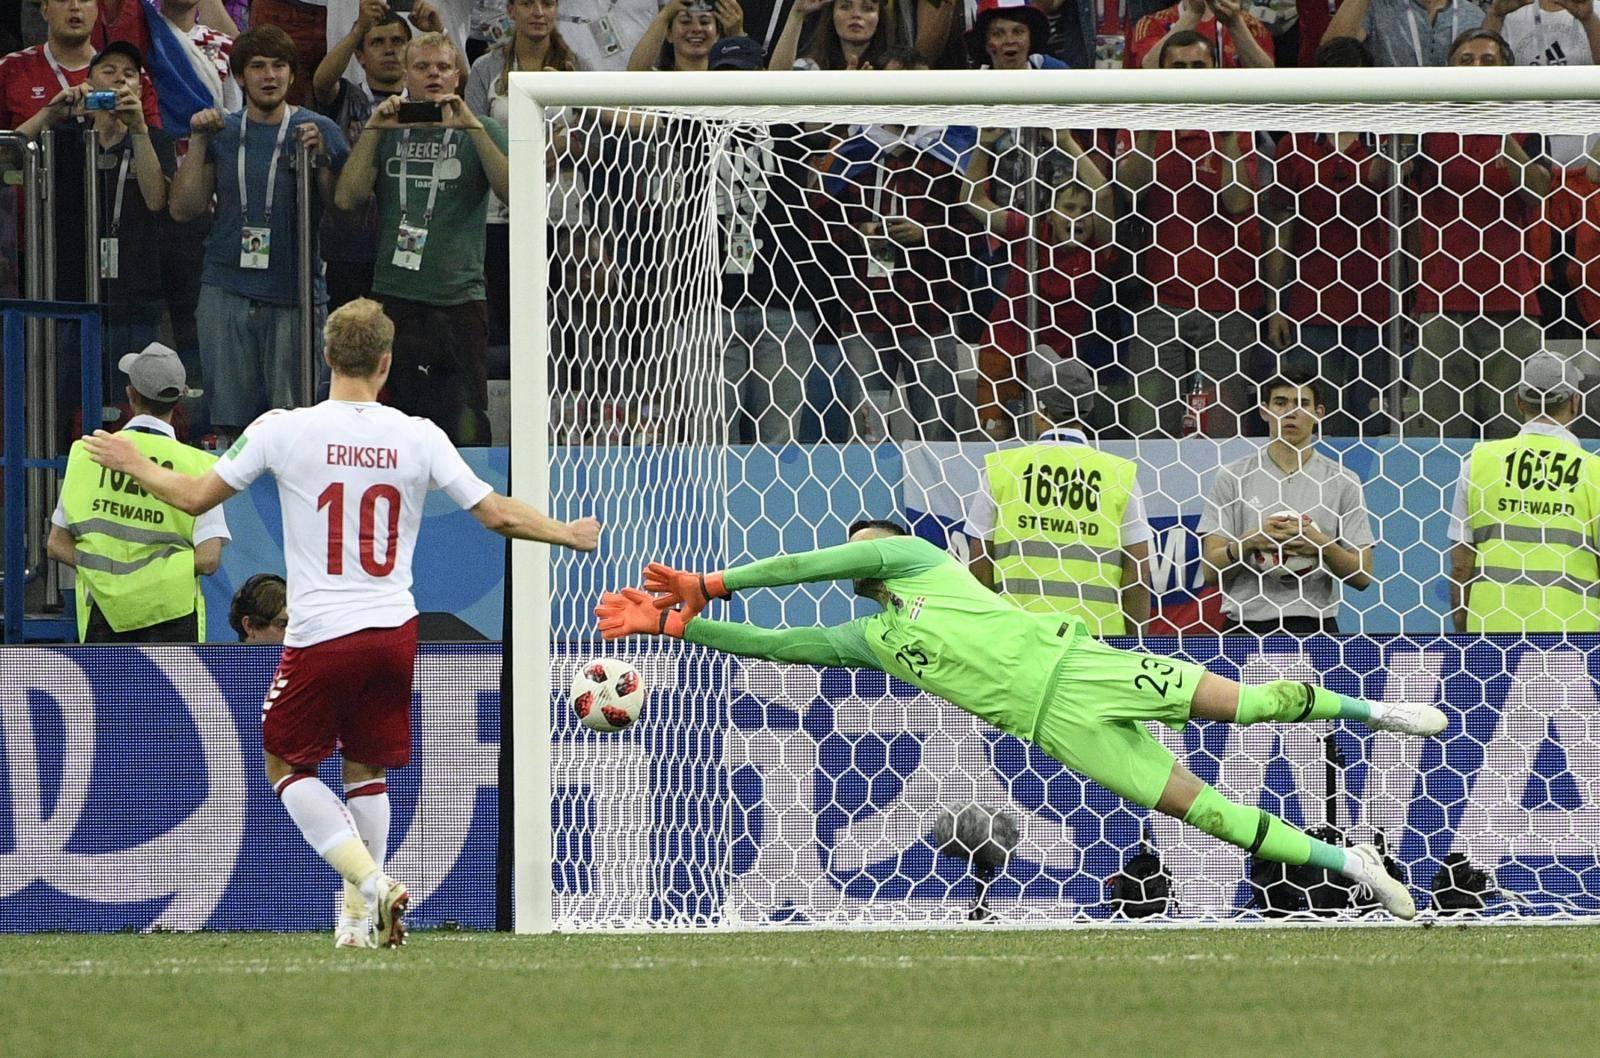 (SP)RUSSIA-NIZHNY NOVGOROD-2018 WORLD CUP-ROUND OF 16-CROATIA VS DENMARK